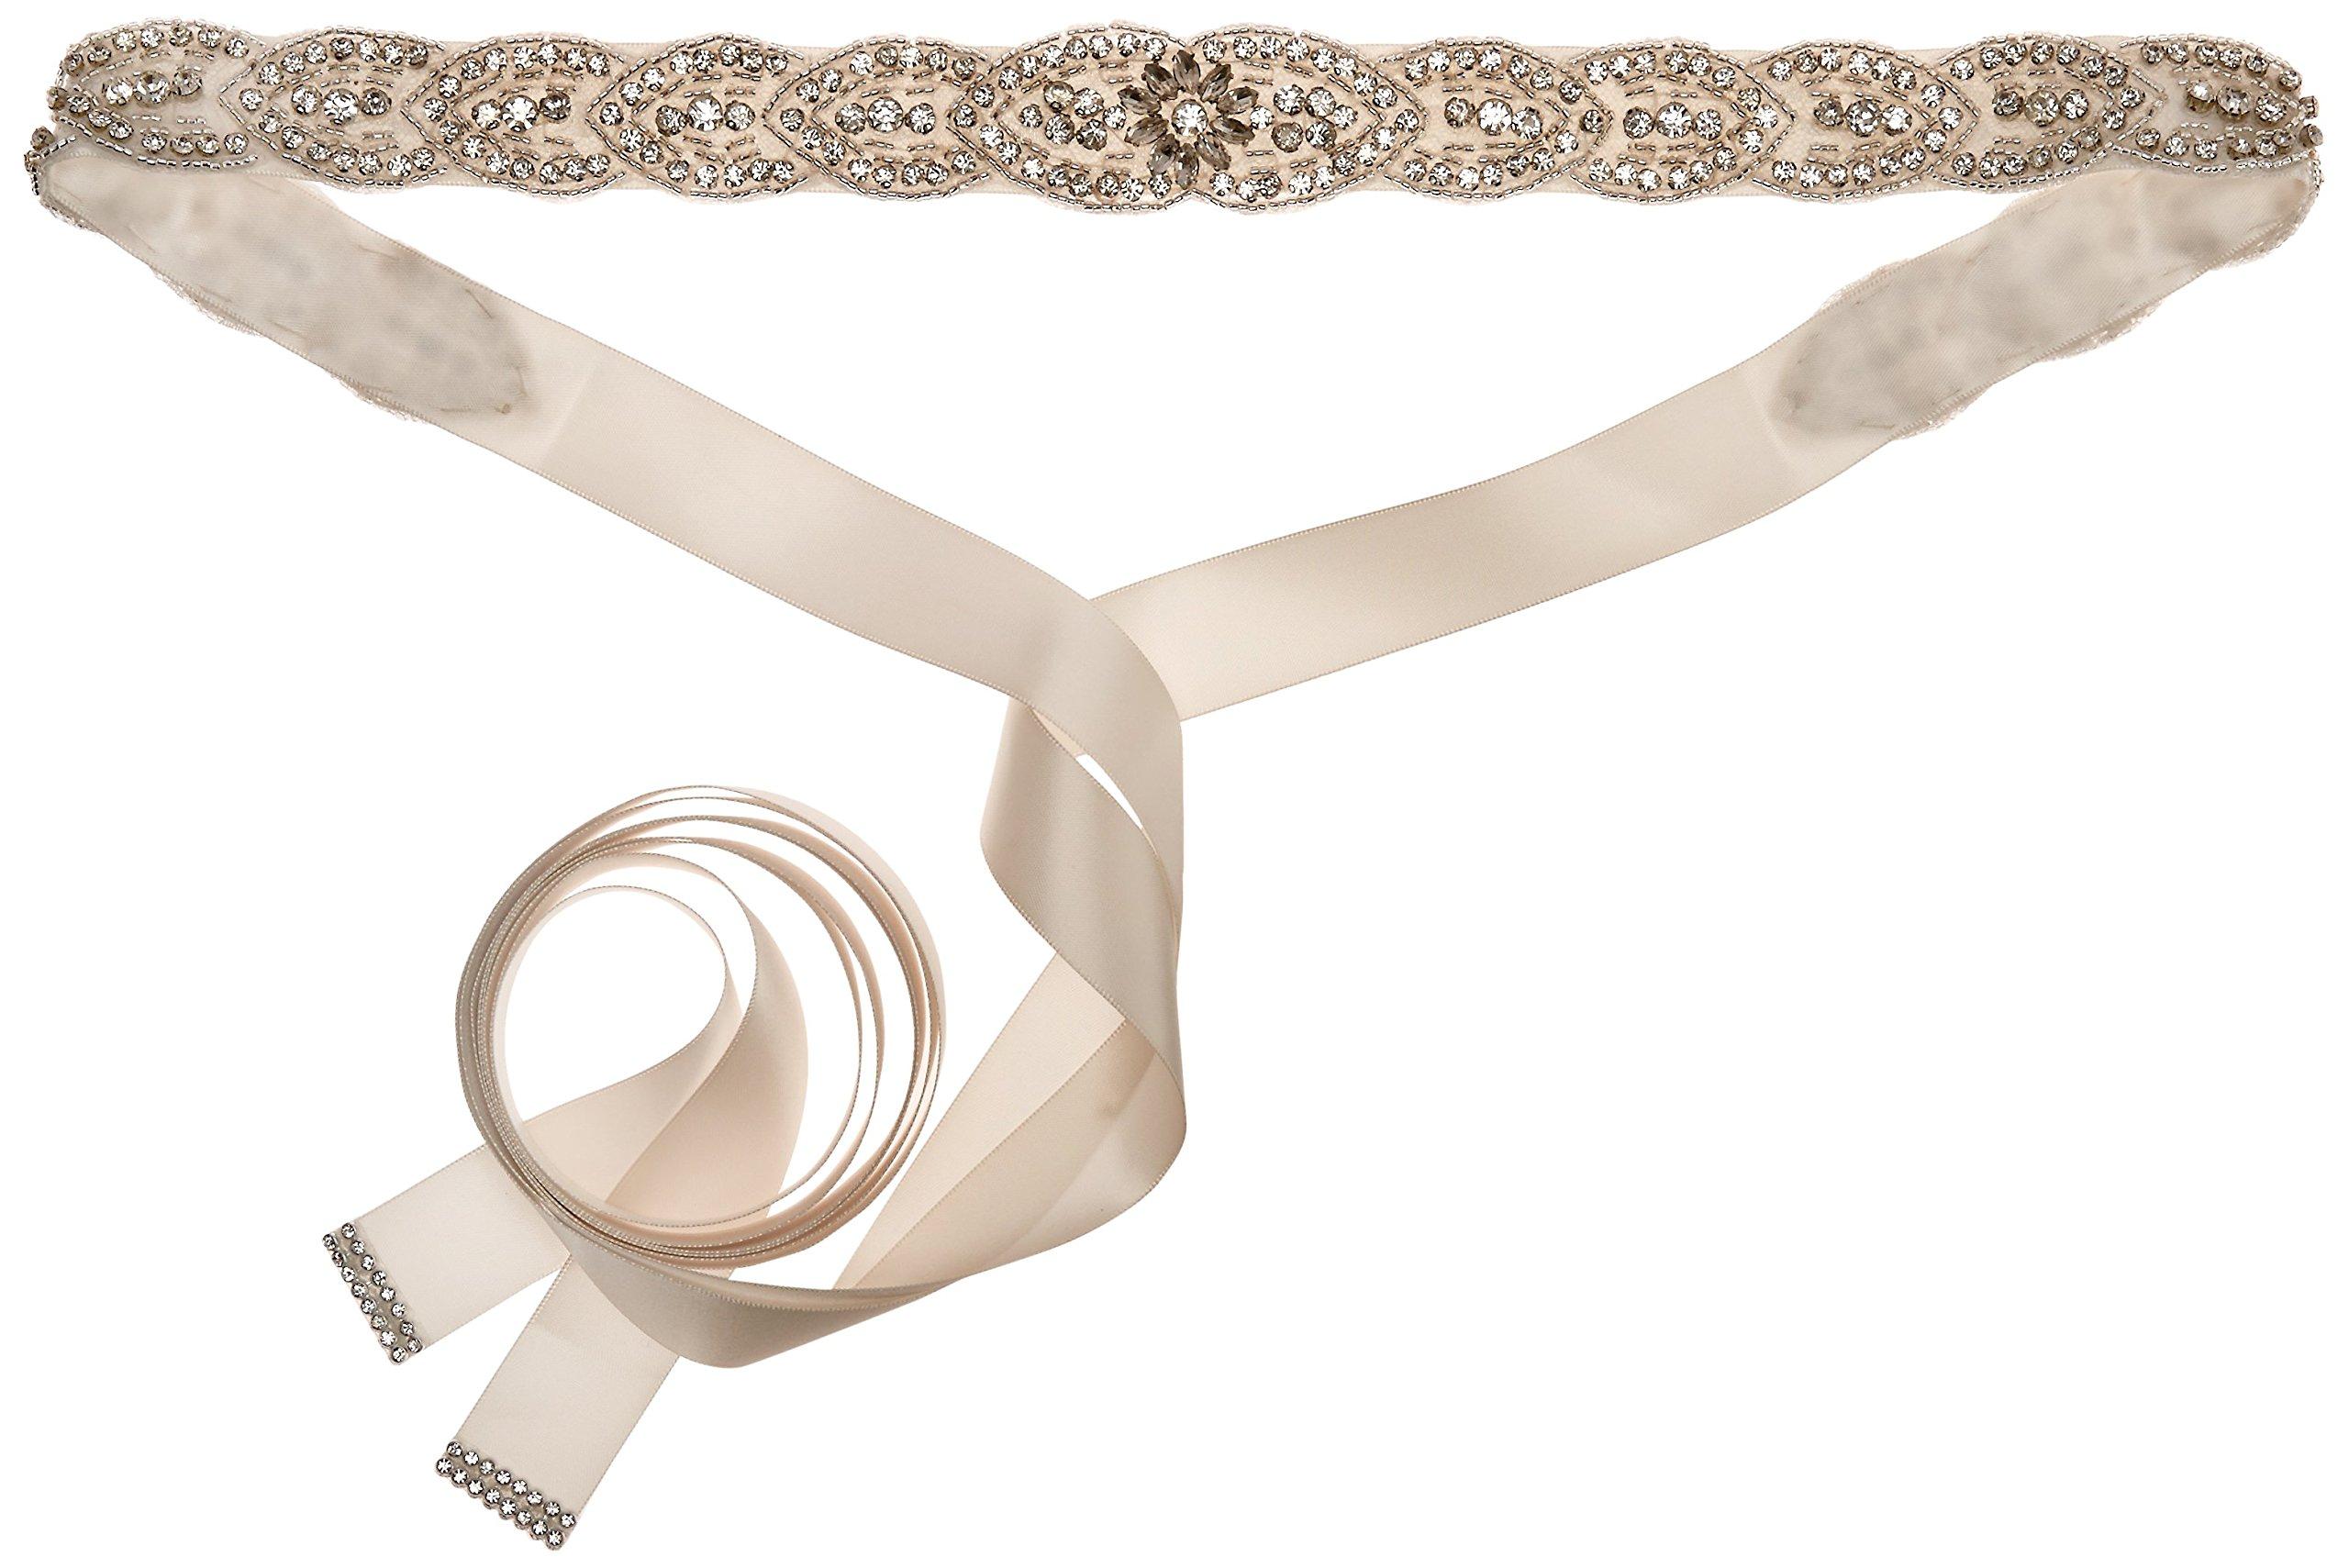 Nina Women's Marisa Romantic Satin Bridal Belt, Ivory, One Size by Nina